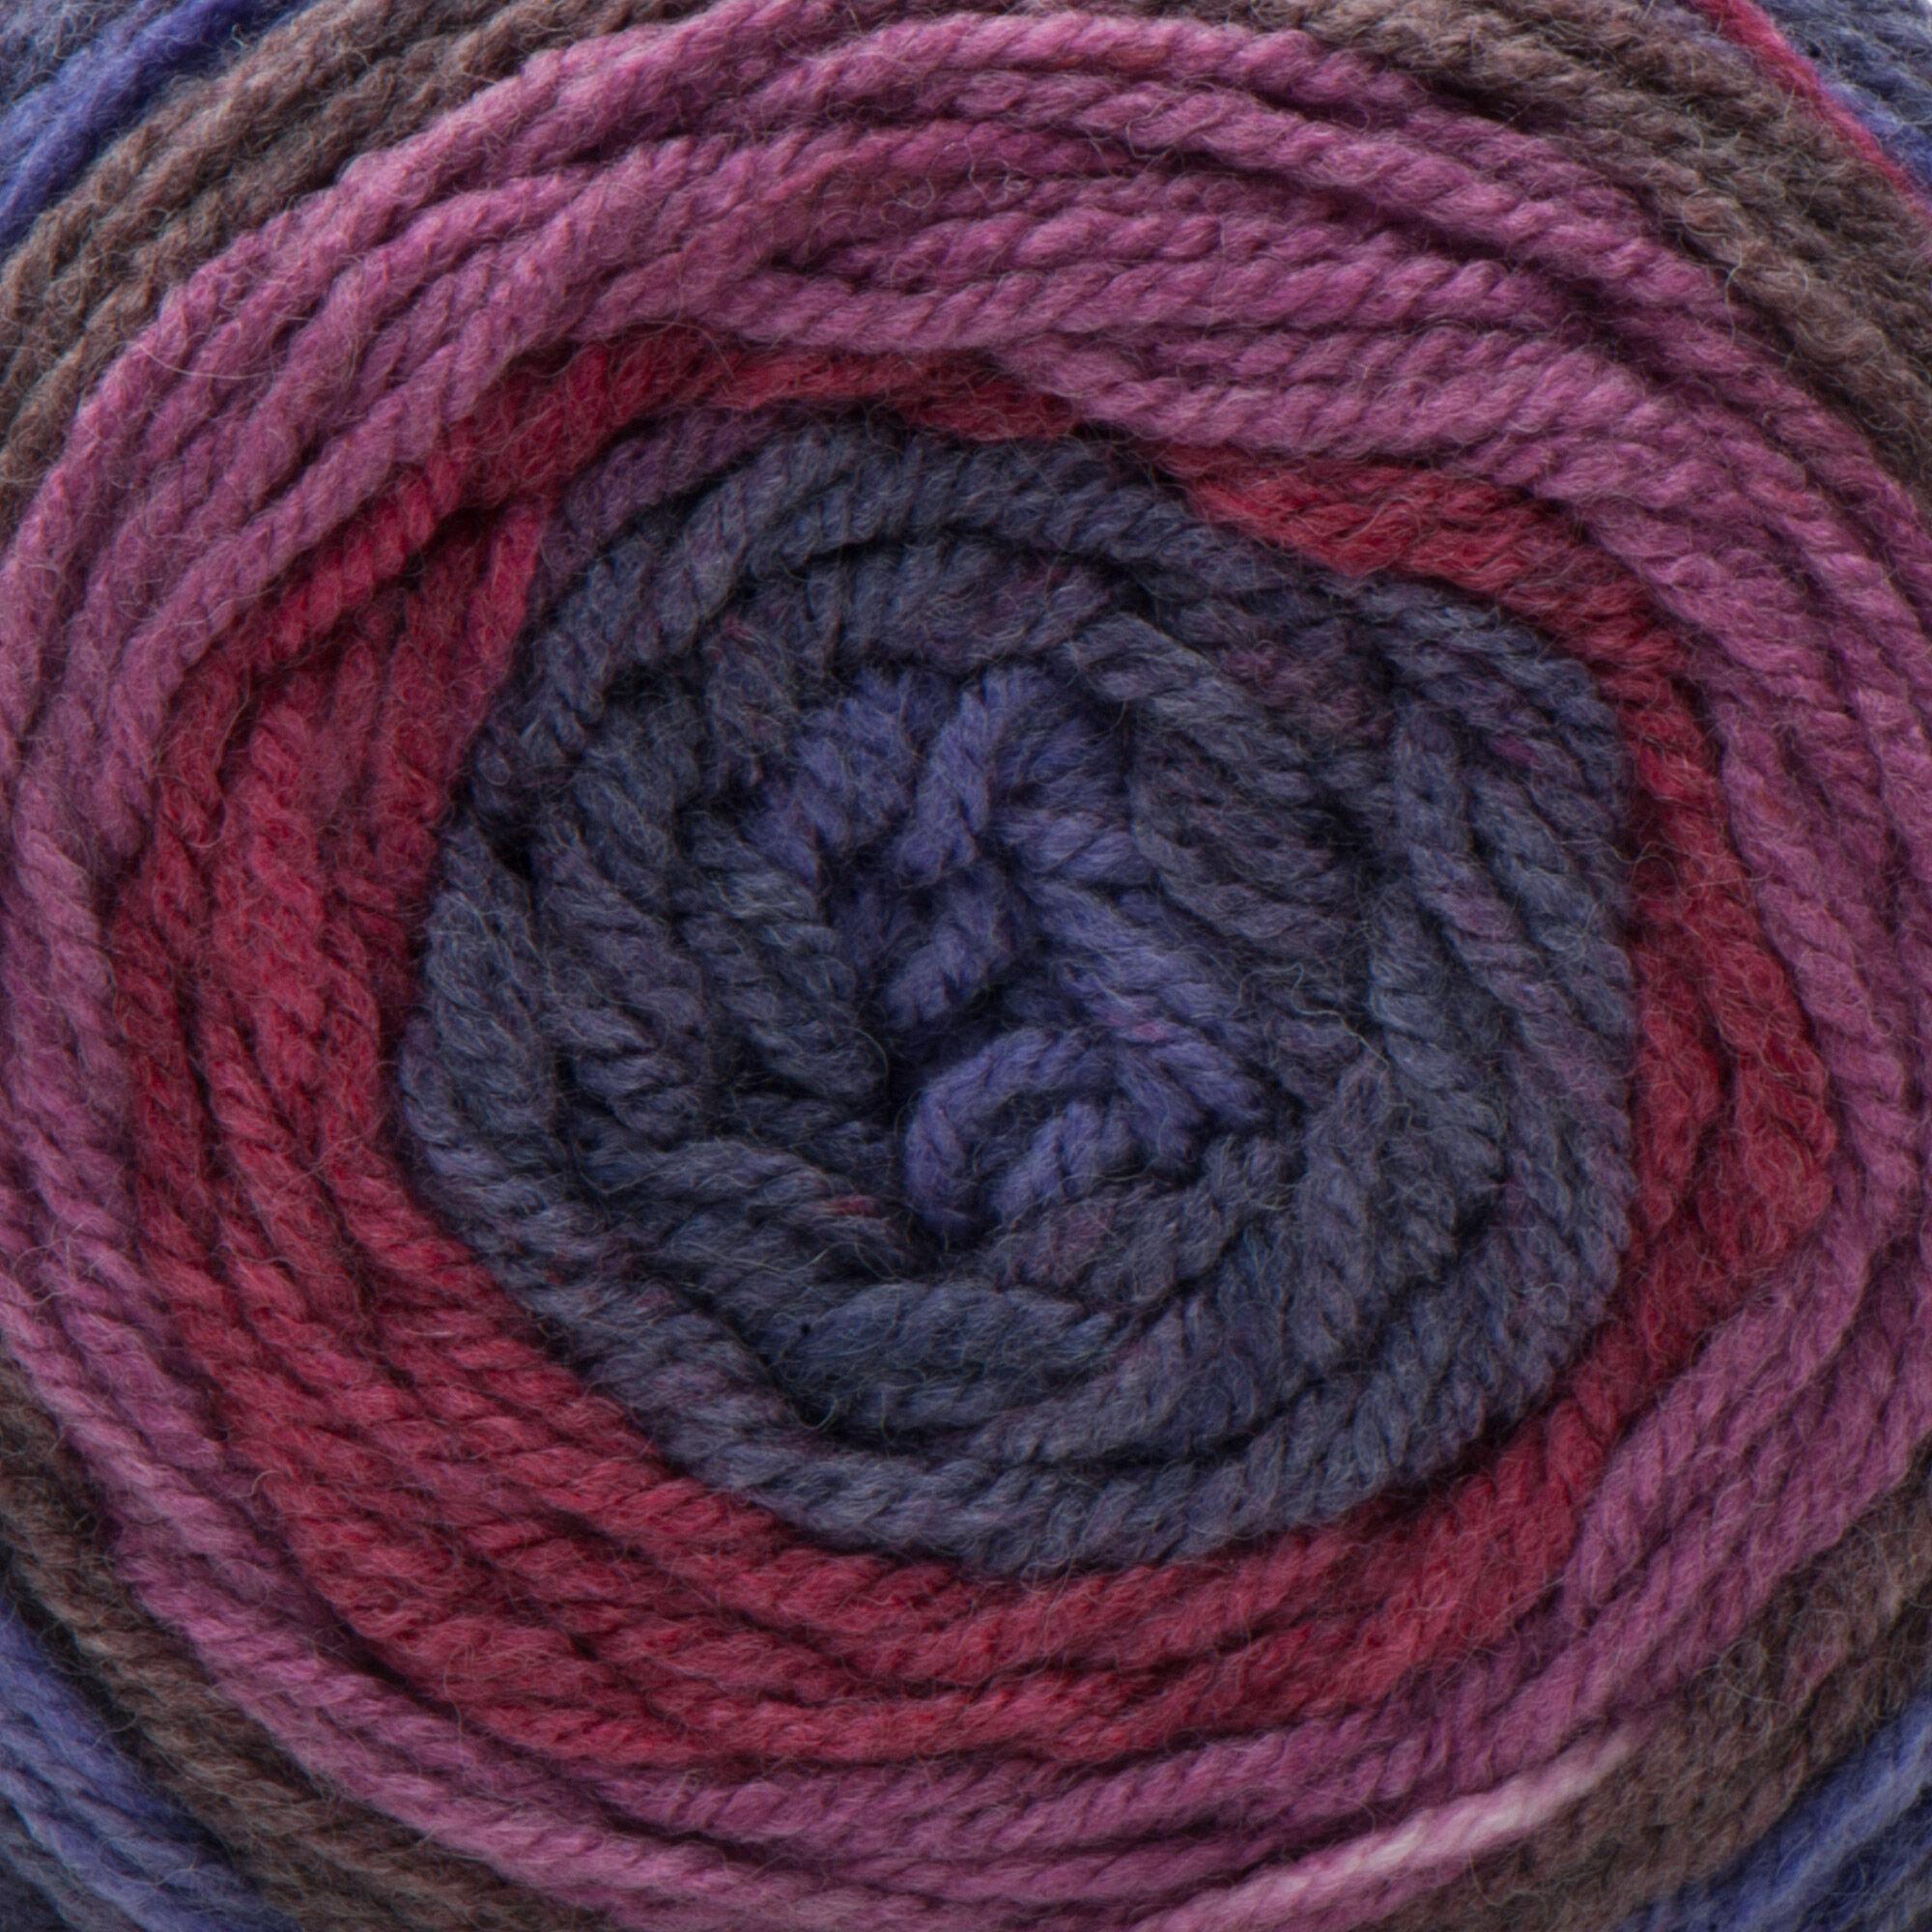 Caron Cakes Yarn, Blackberry Mousse | Yarnspirations